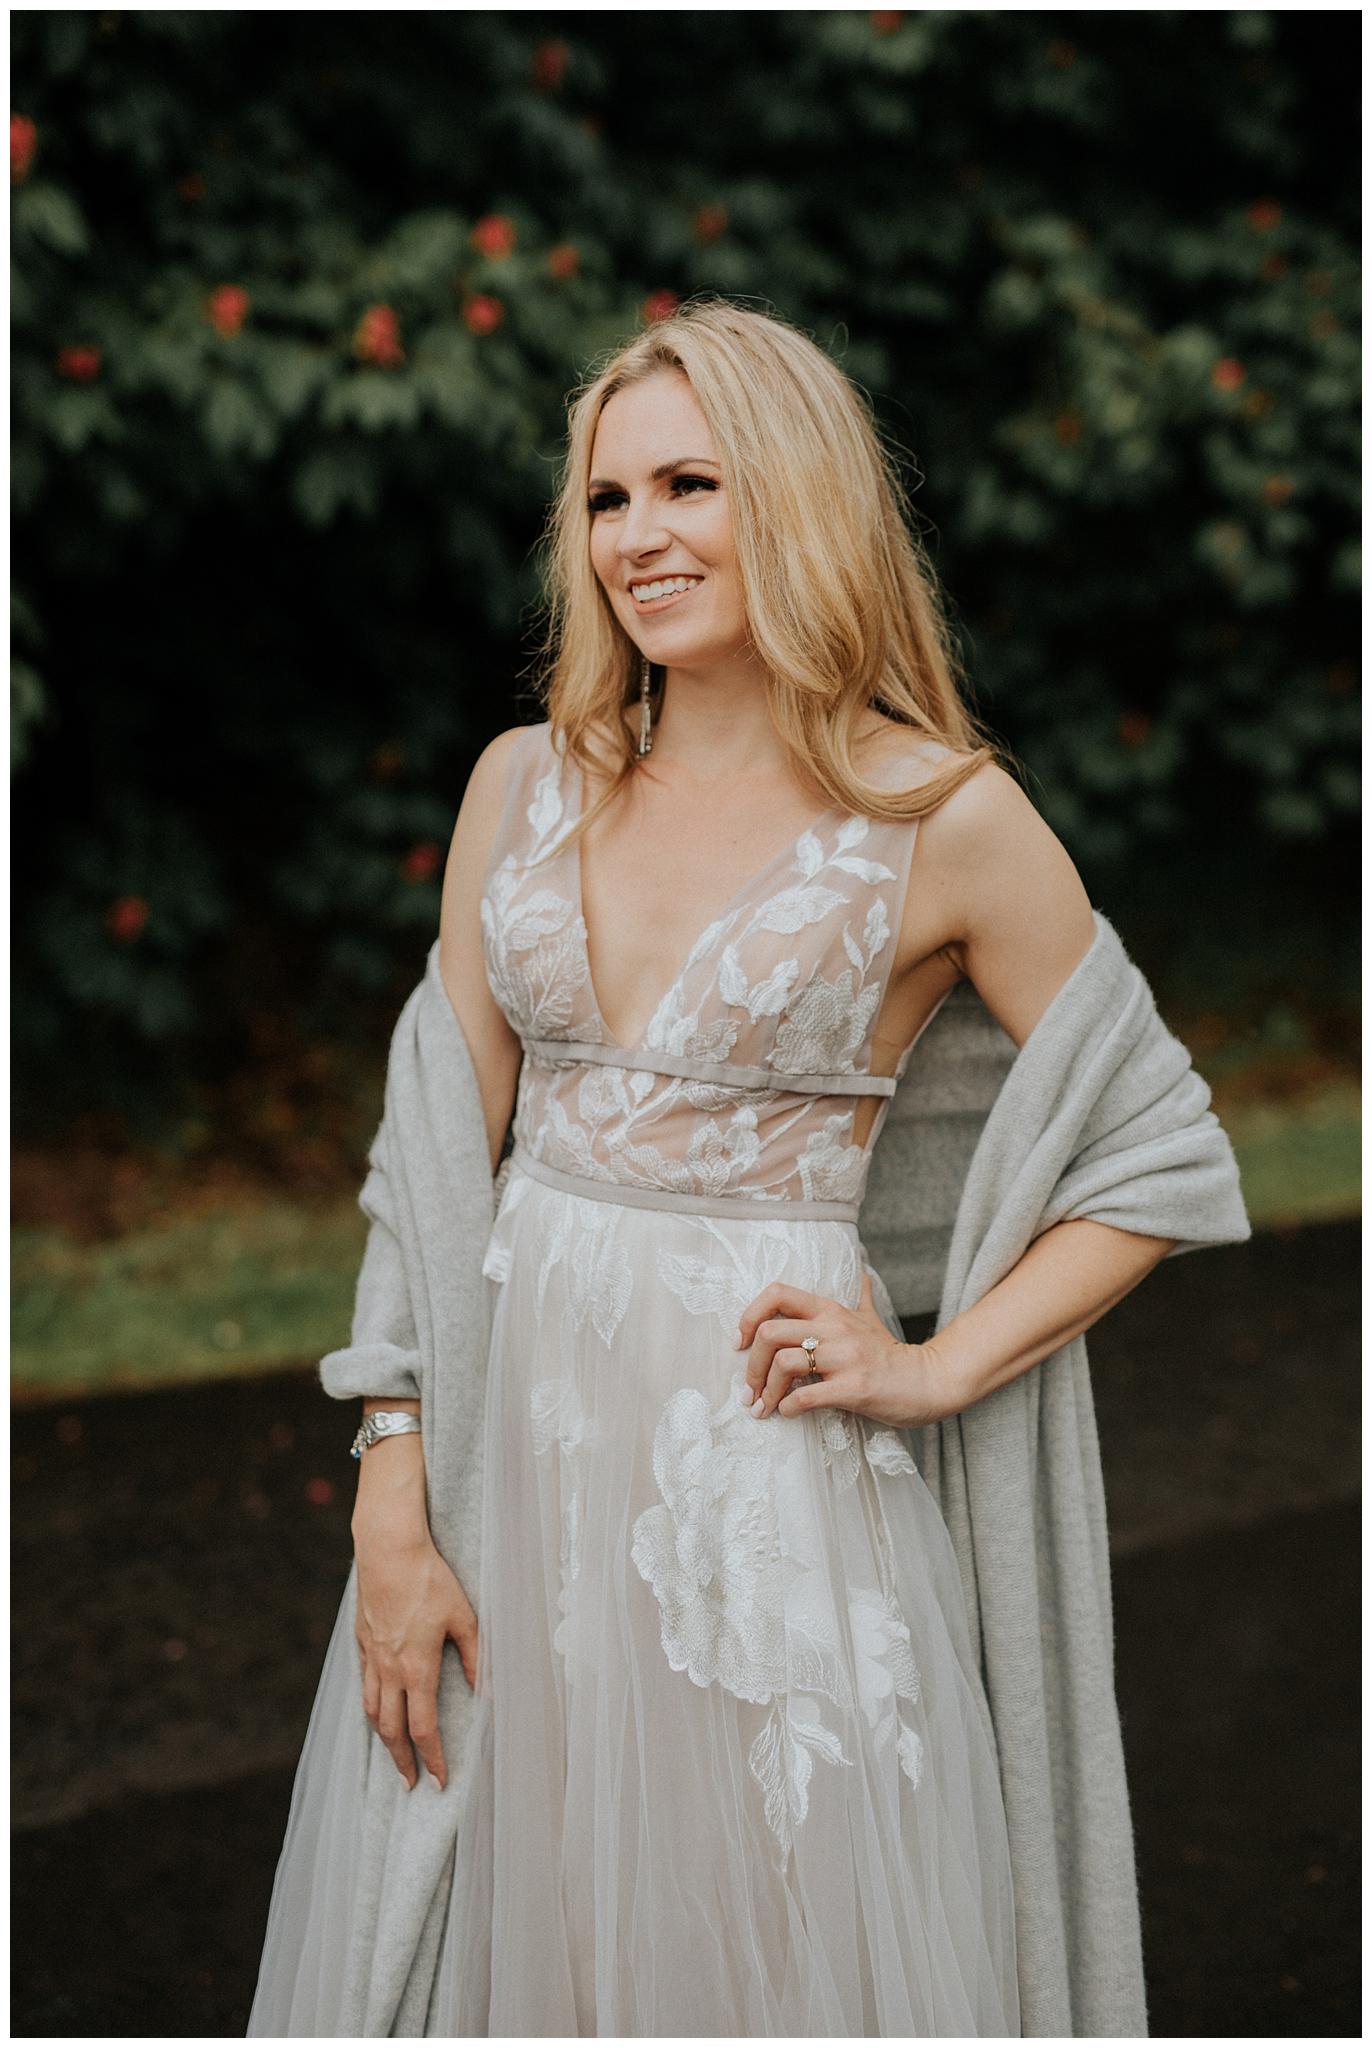 austin-texas-scottish-wedding-bride-groom21992.JPG